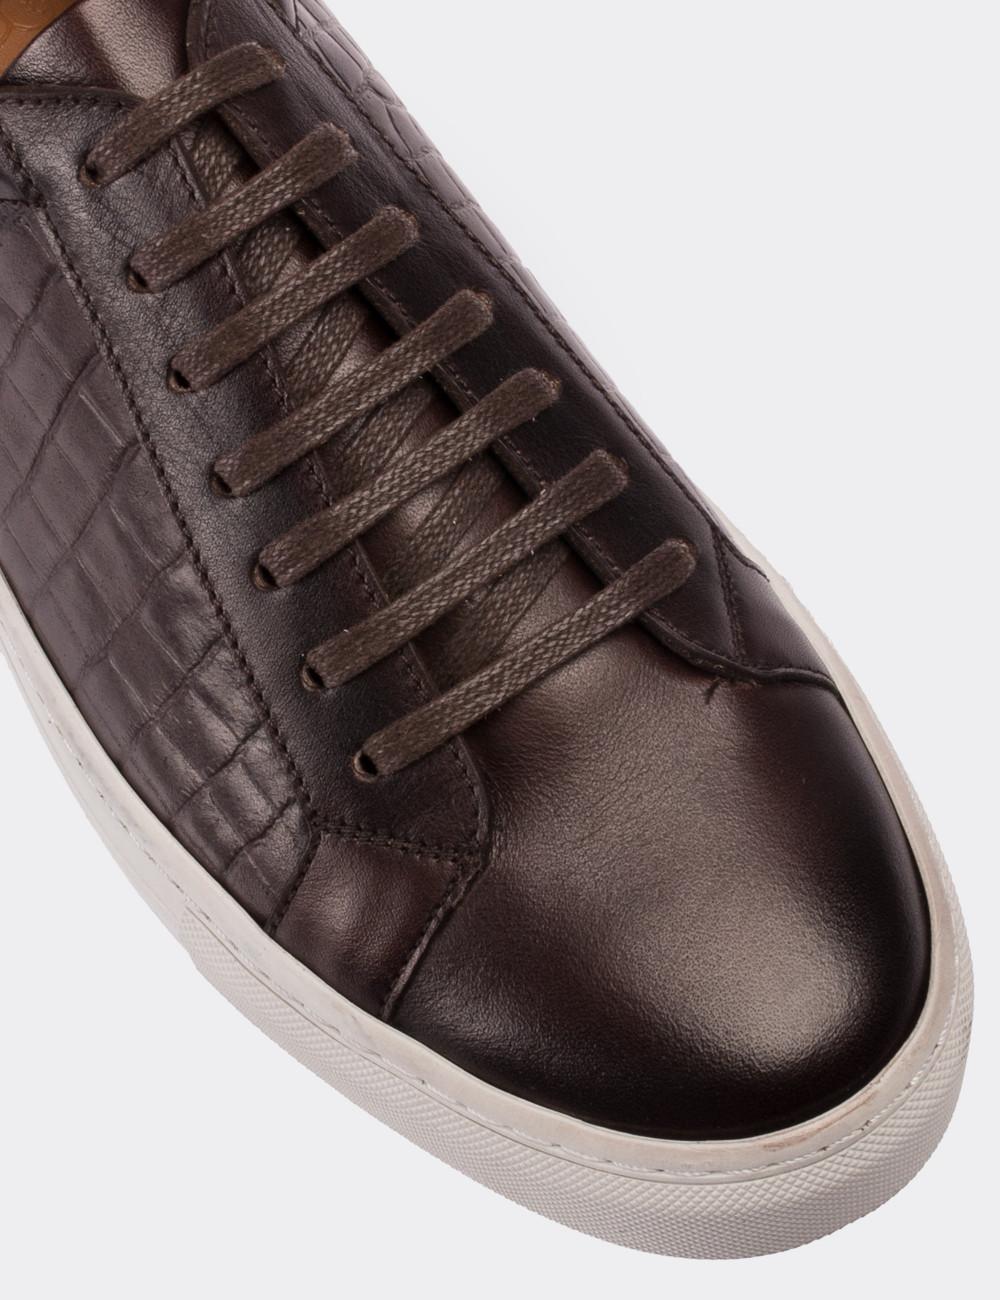 Hakiki Deri Kroko Kahverengi Erkek Sneaker - 01641MKHVC03